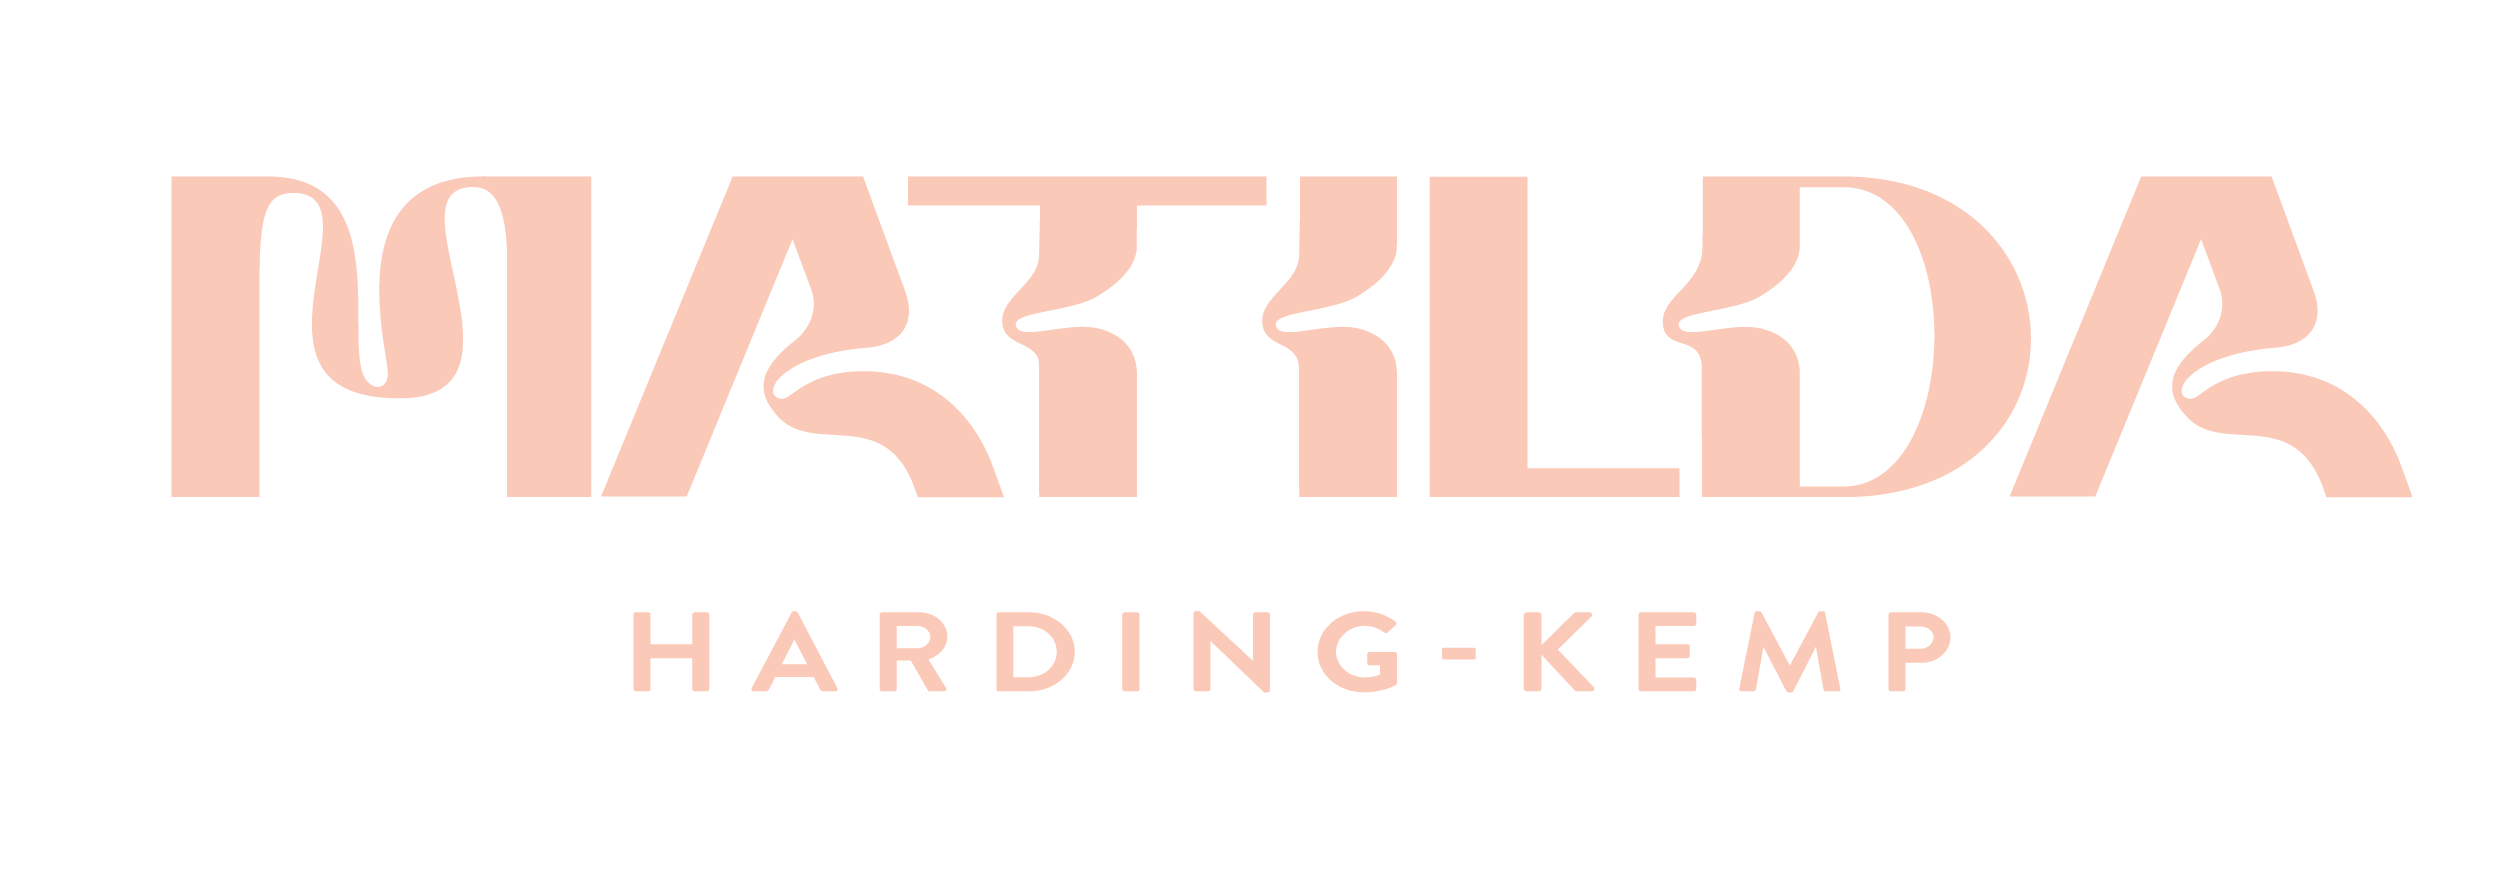 M A Harding-Kemp